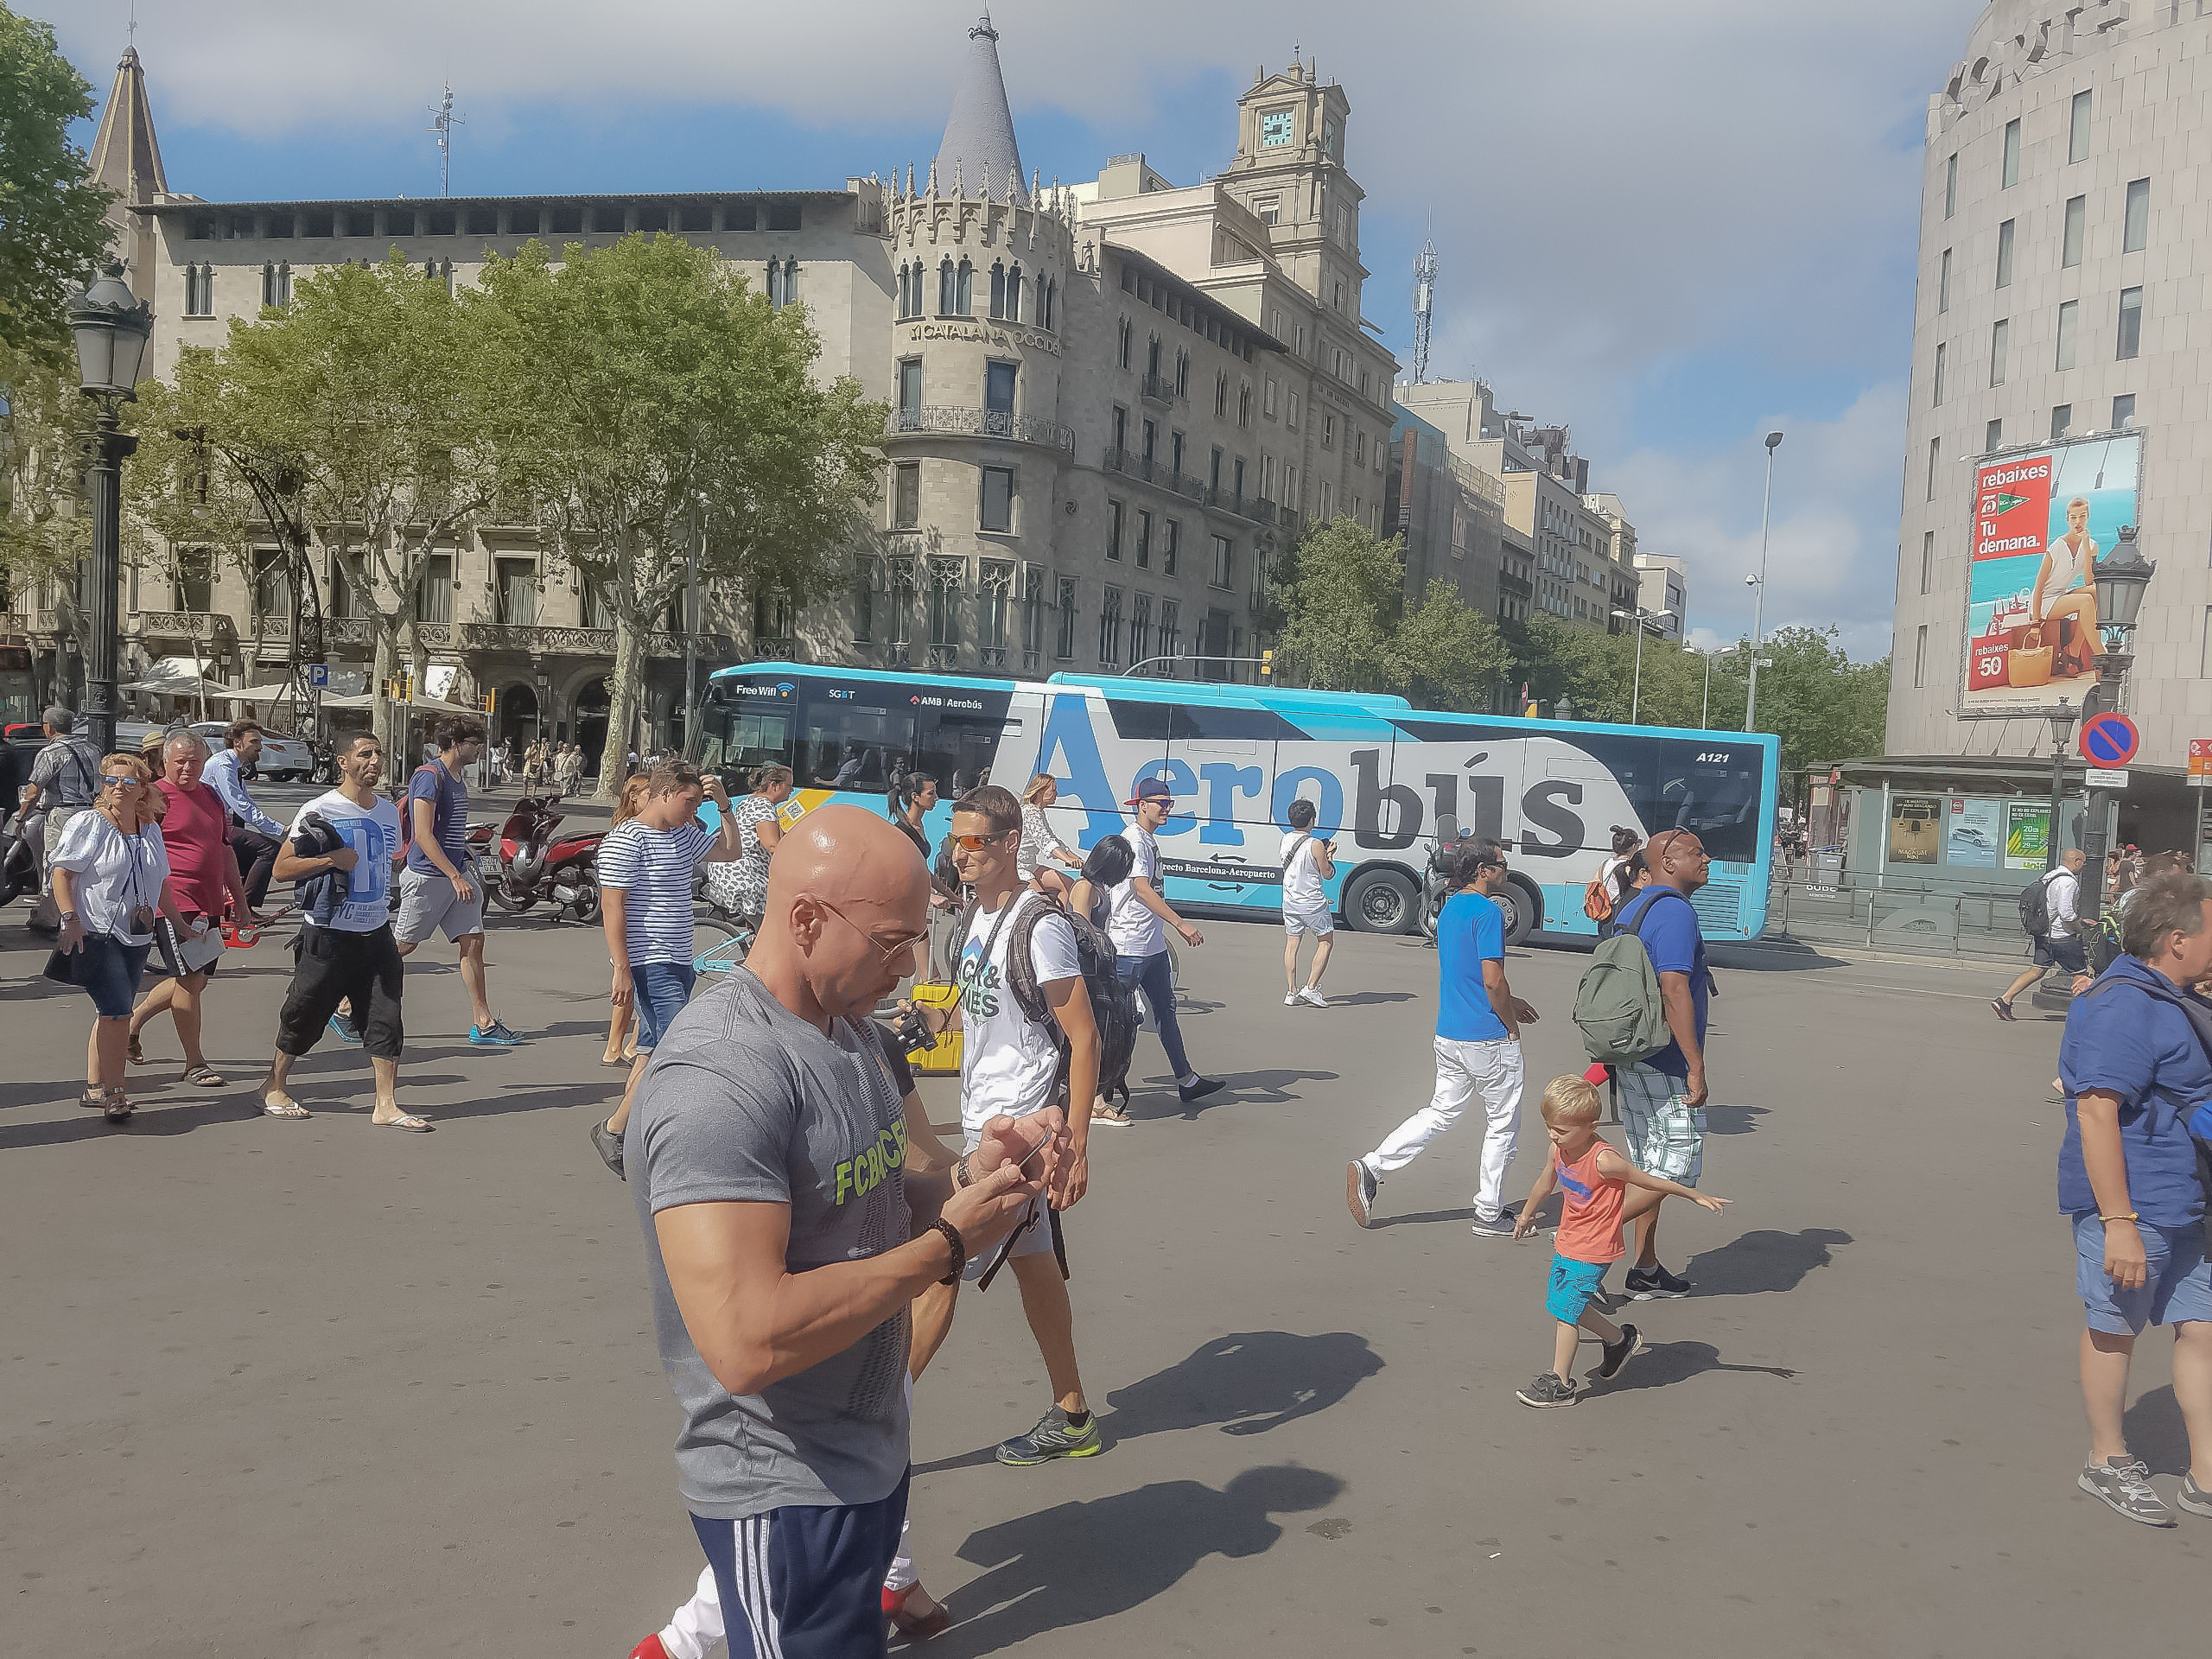 tourist in barcelona